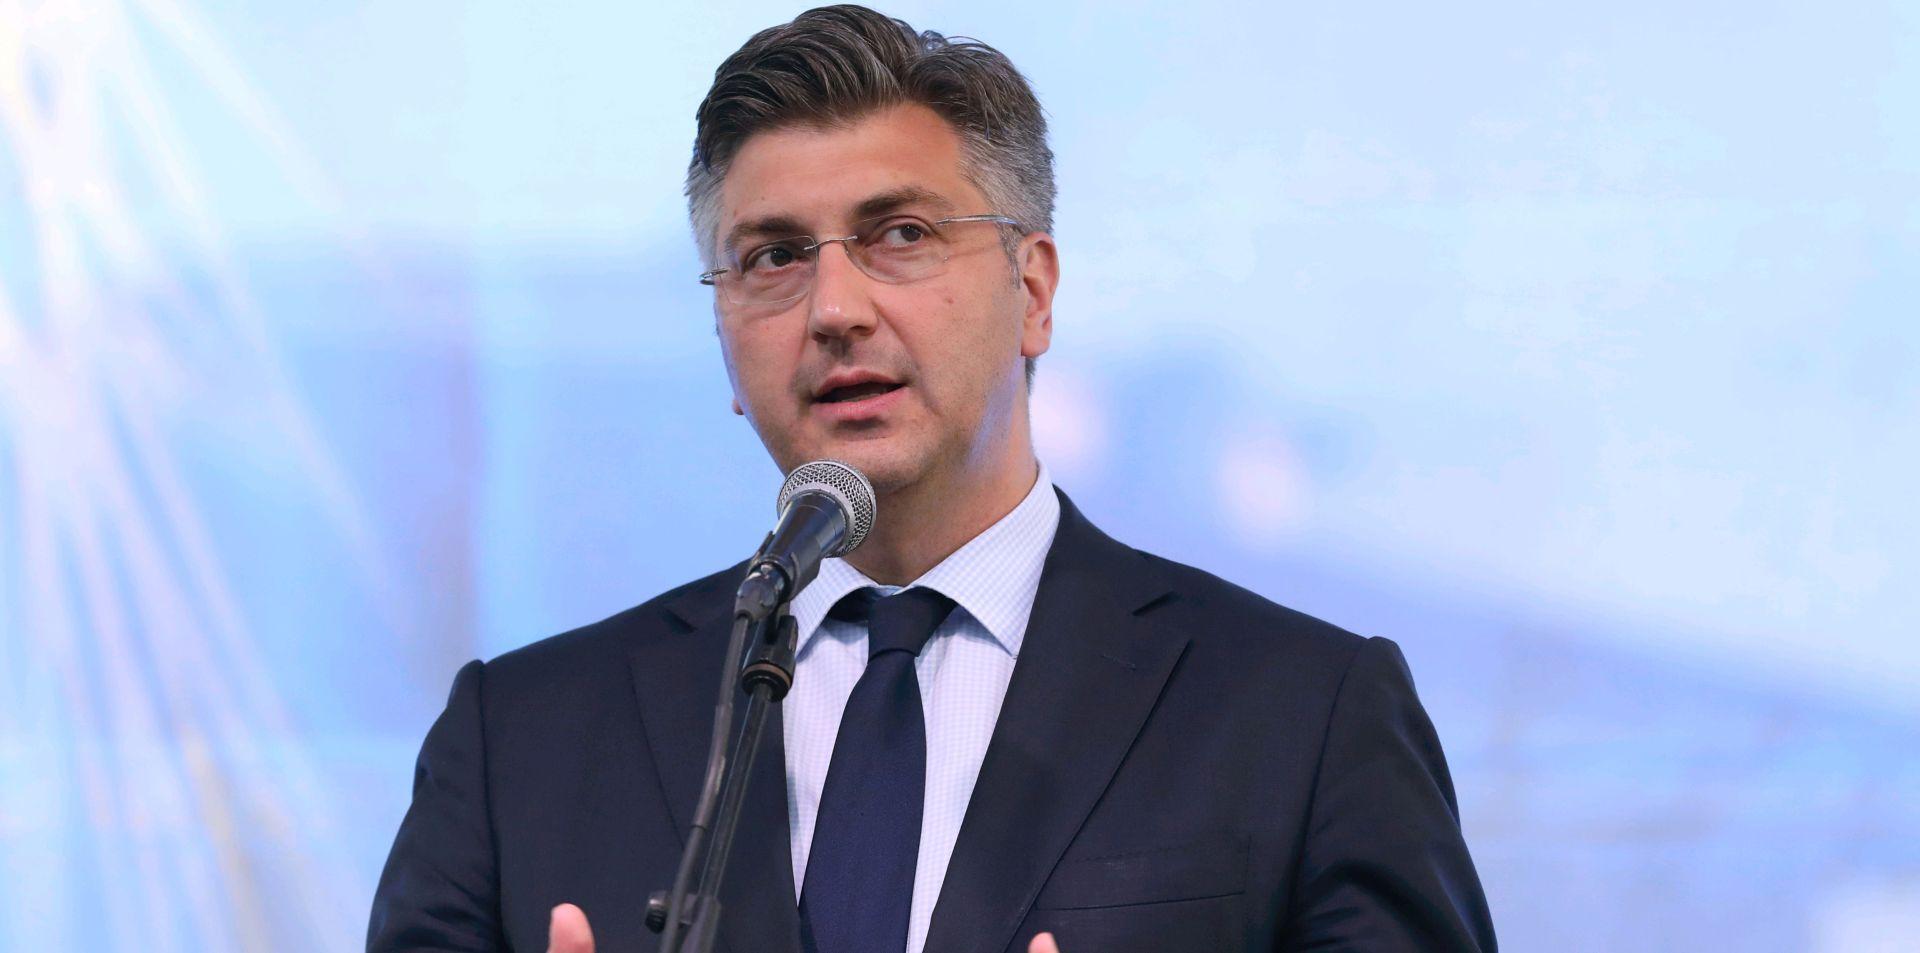 PLENKOVIĆ O SUFINANCIRANJU PELJEŠKOG MOSTA Svečana ceremonija u Bruxellesu idući tjedan